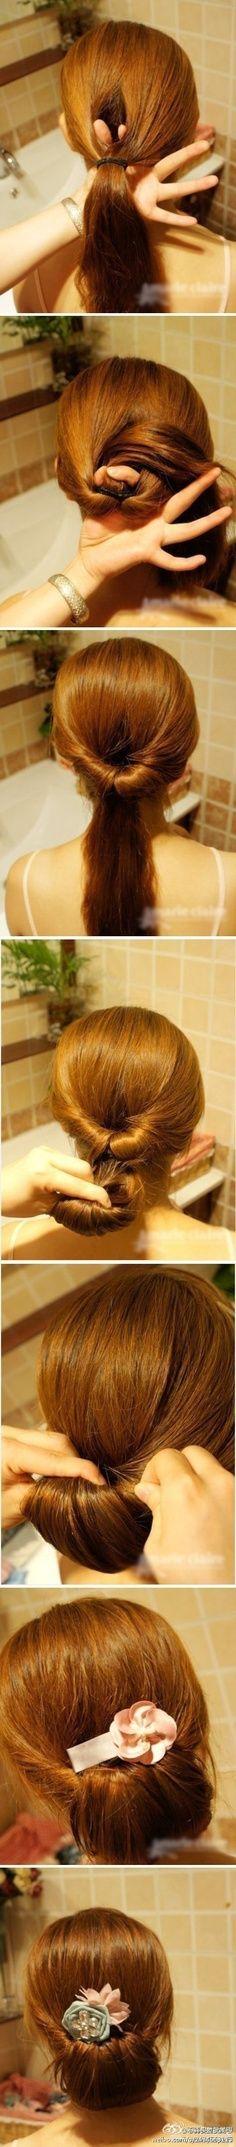 #hair romance <3